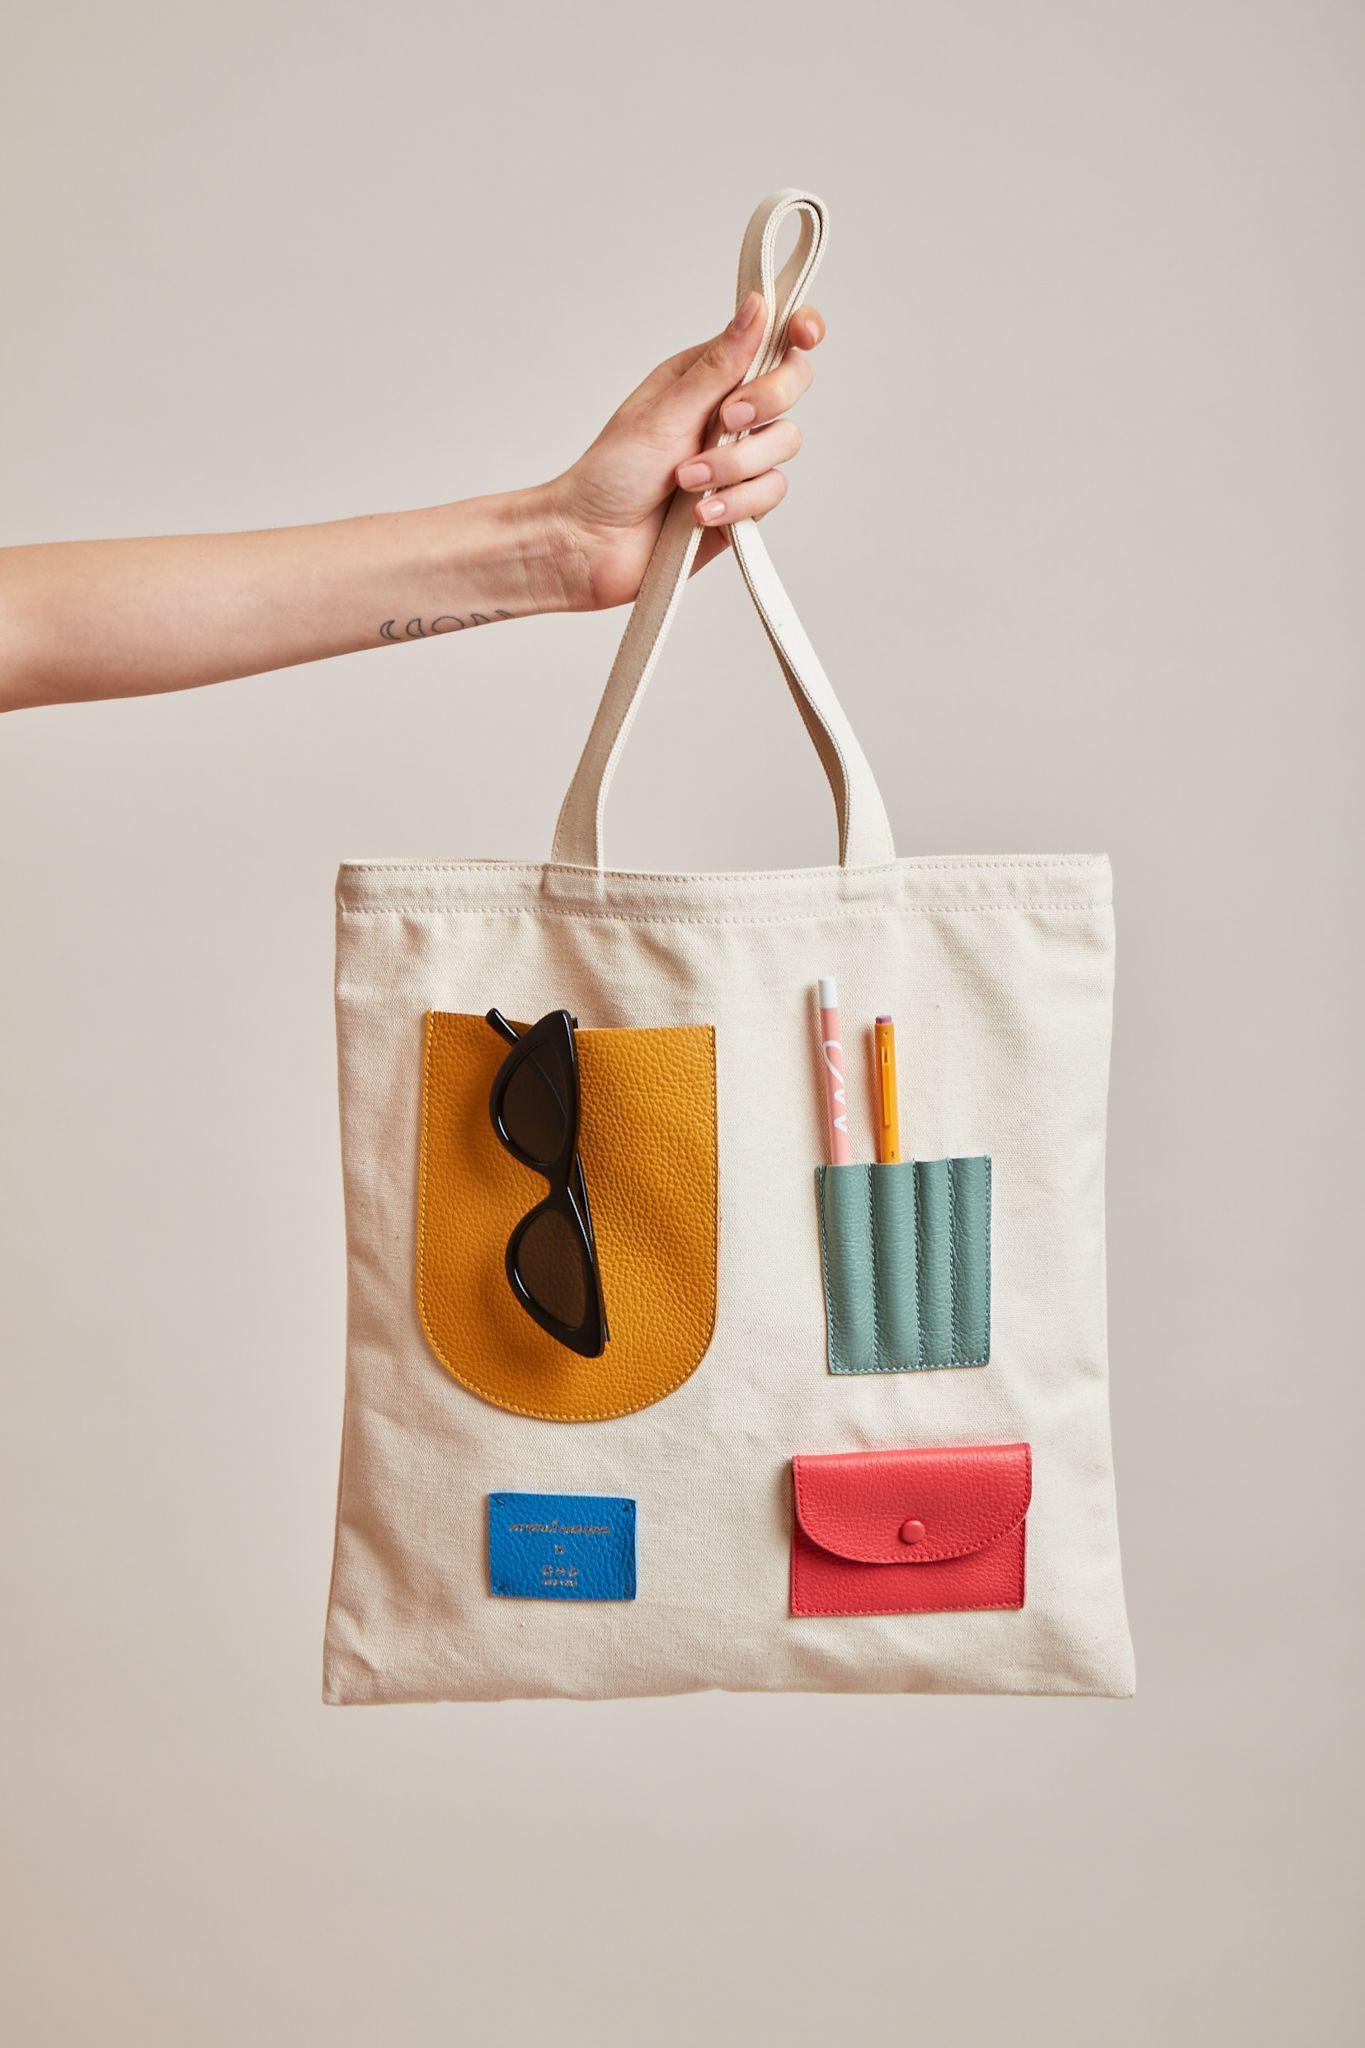 TOTE Pink Tan Floral Patchwork Totebag Grocery bag Bookbag Beachbag Lunchbag Laptop Bag Overnight Purse Tote Lunchbag Cotton Gift for Her